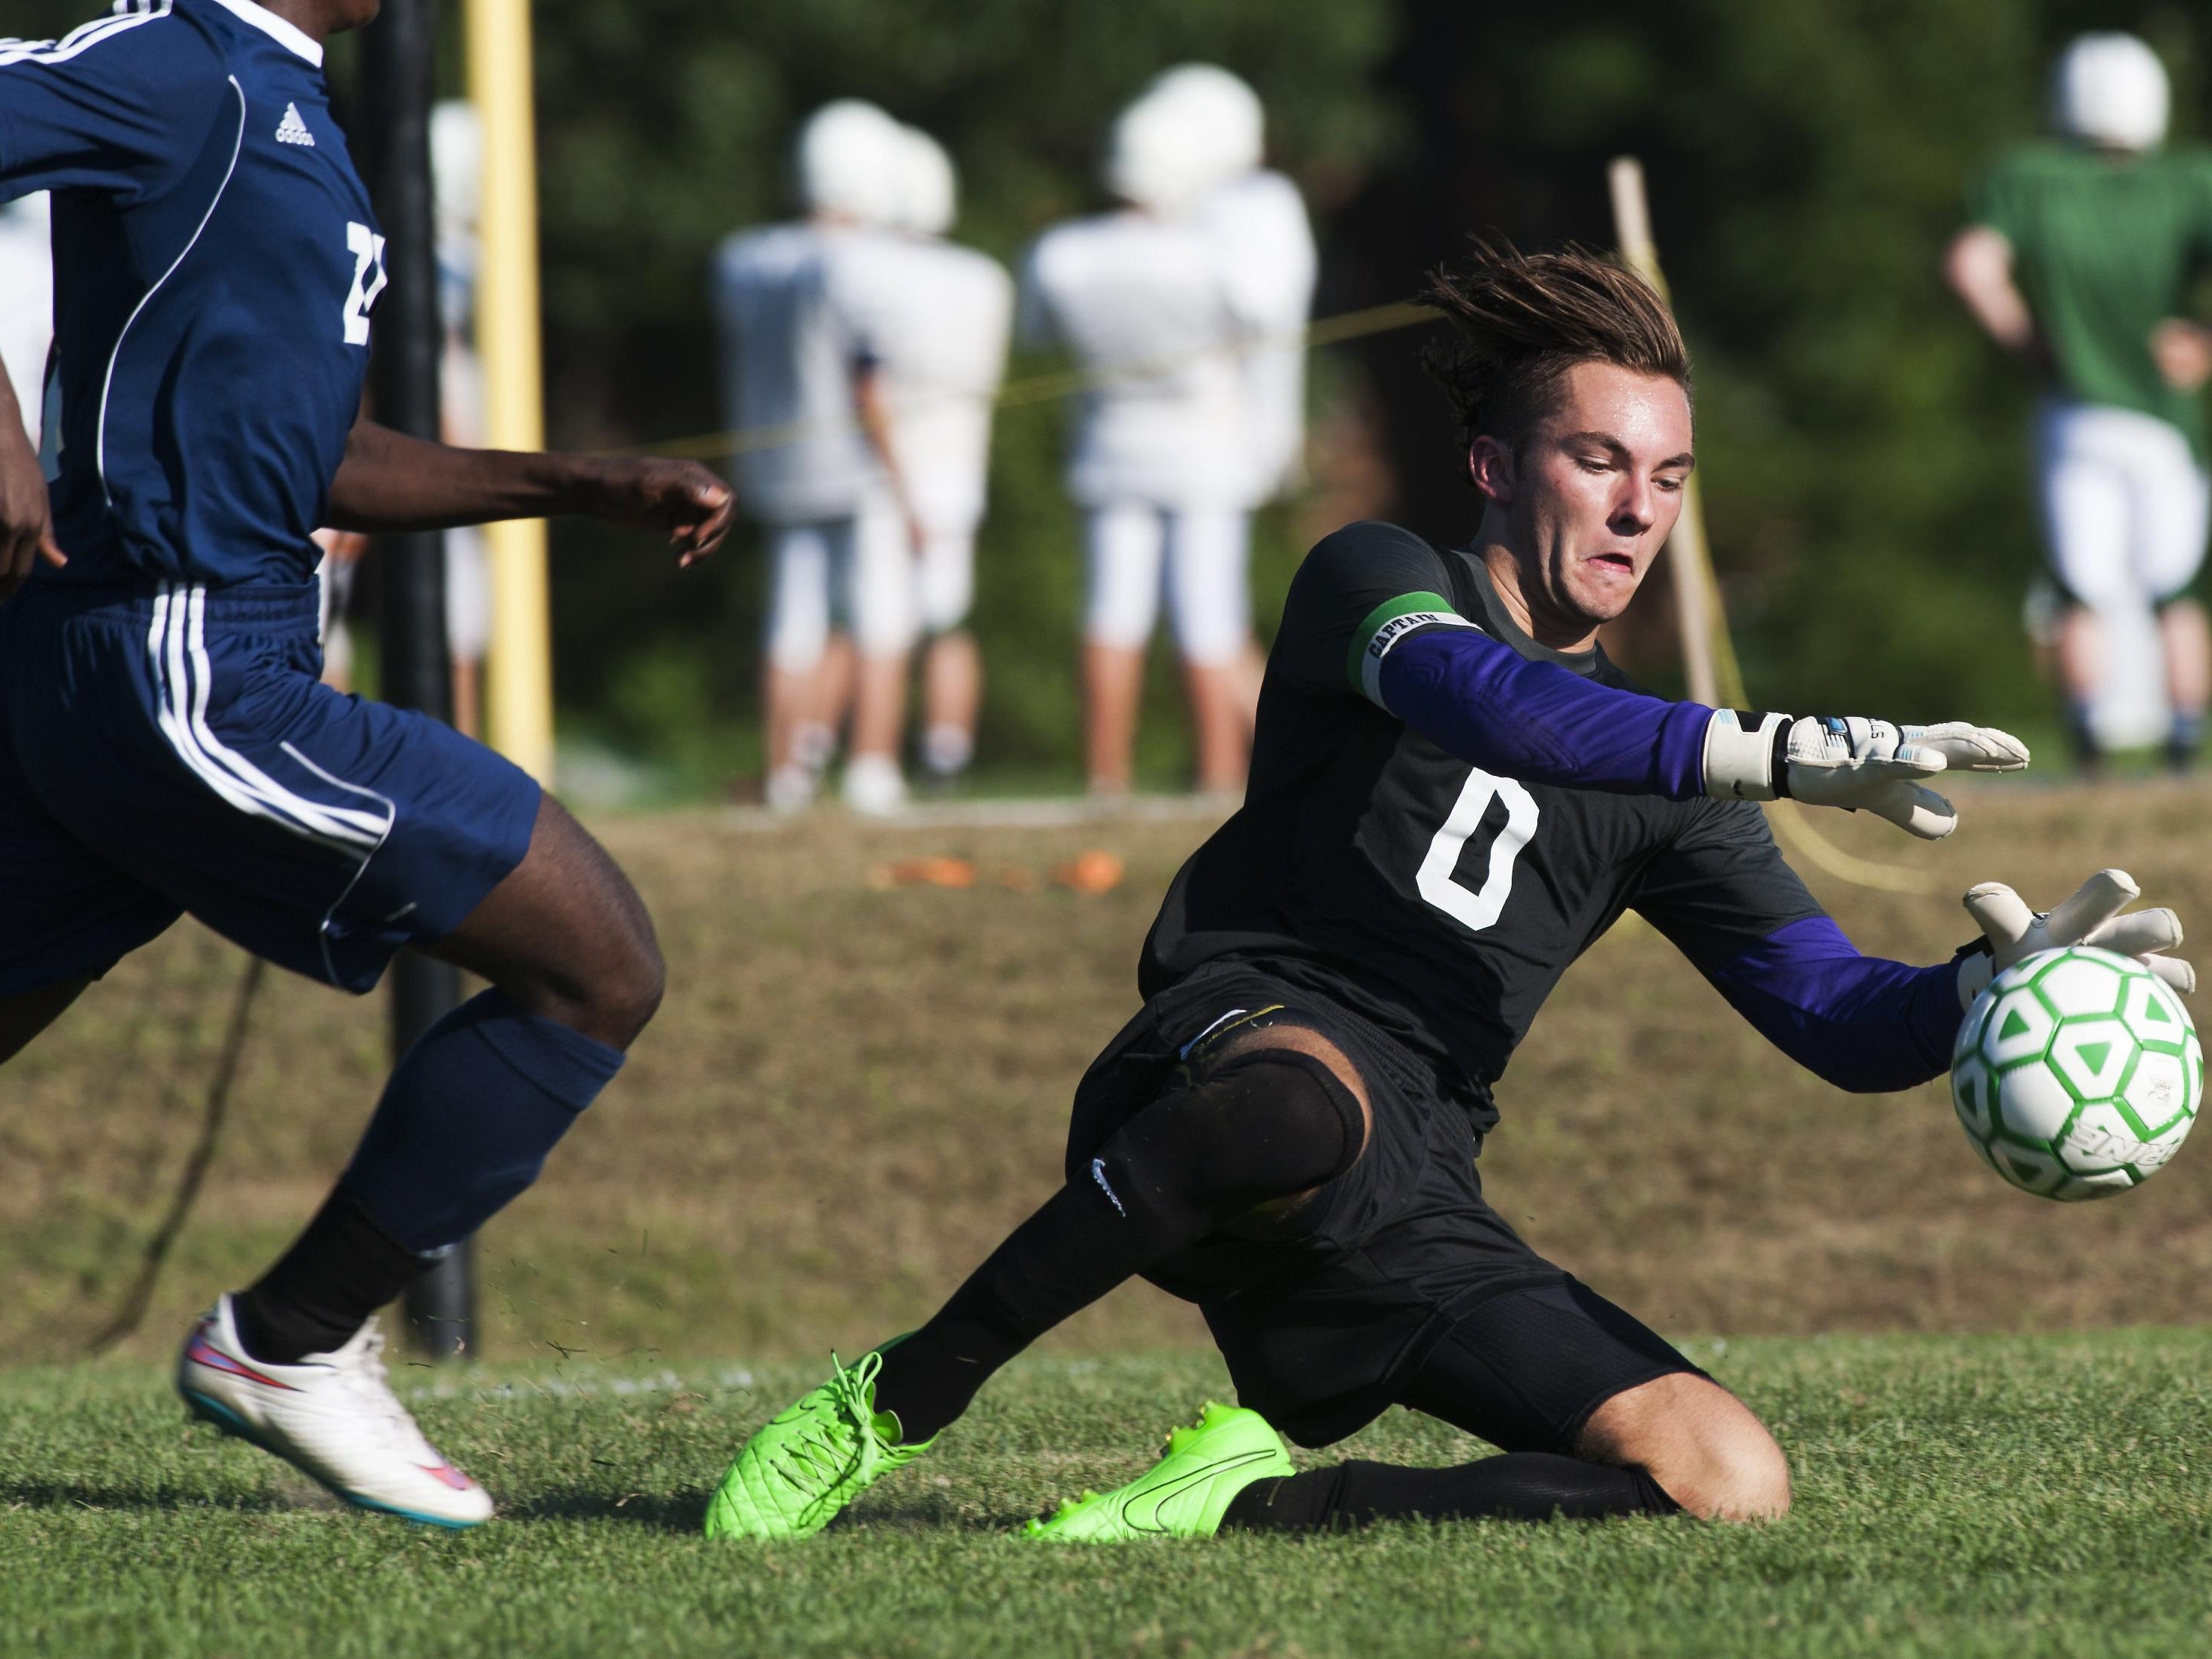 Rice goalie Leland Gazo (0) makes a save during a high school boys soccer game earlier this season.